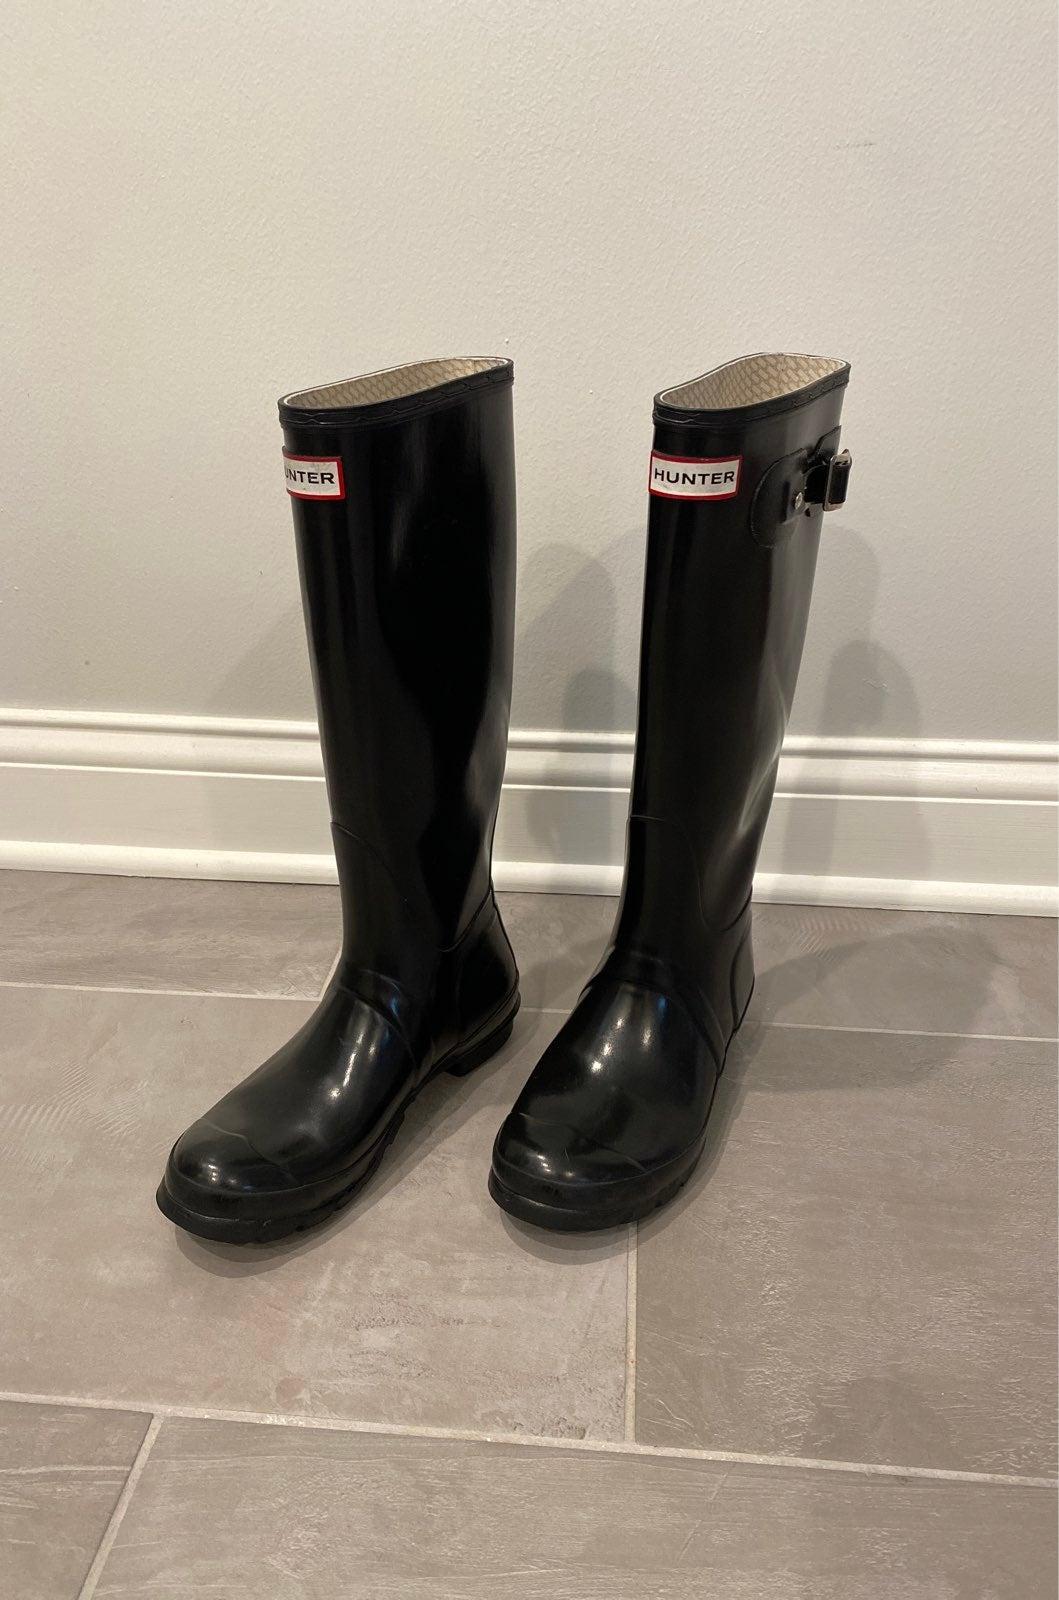 Hunter Boots, black glossy tall 7